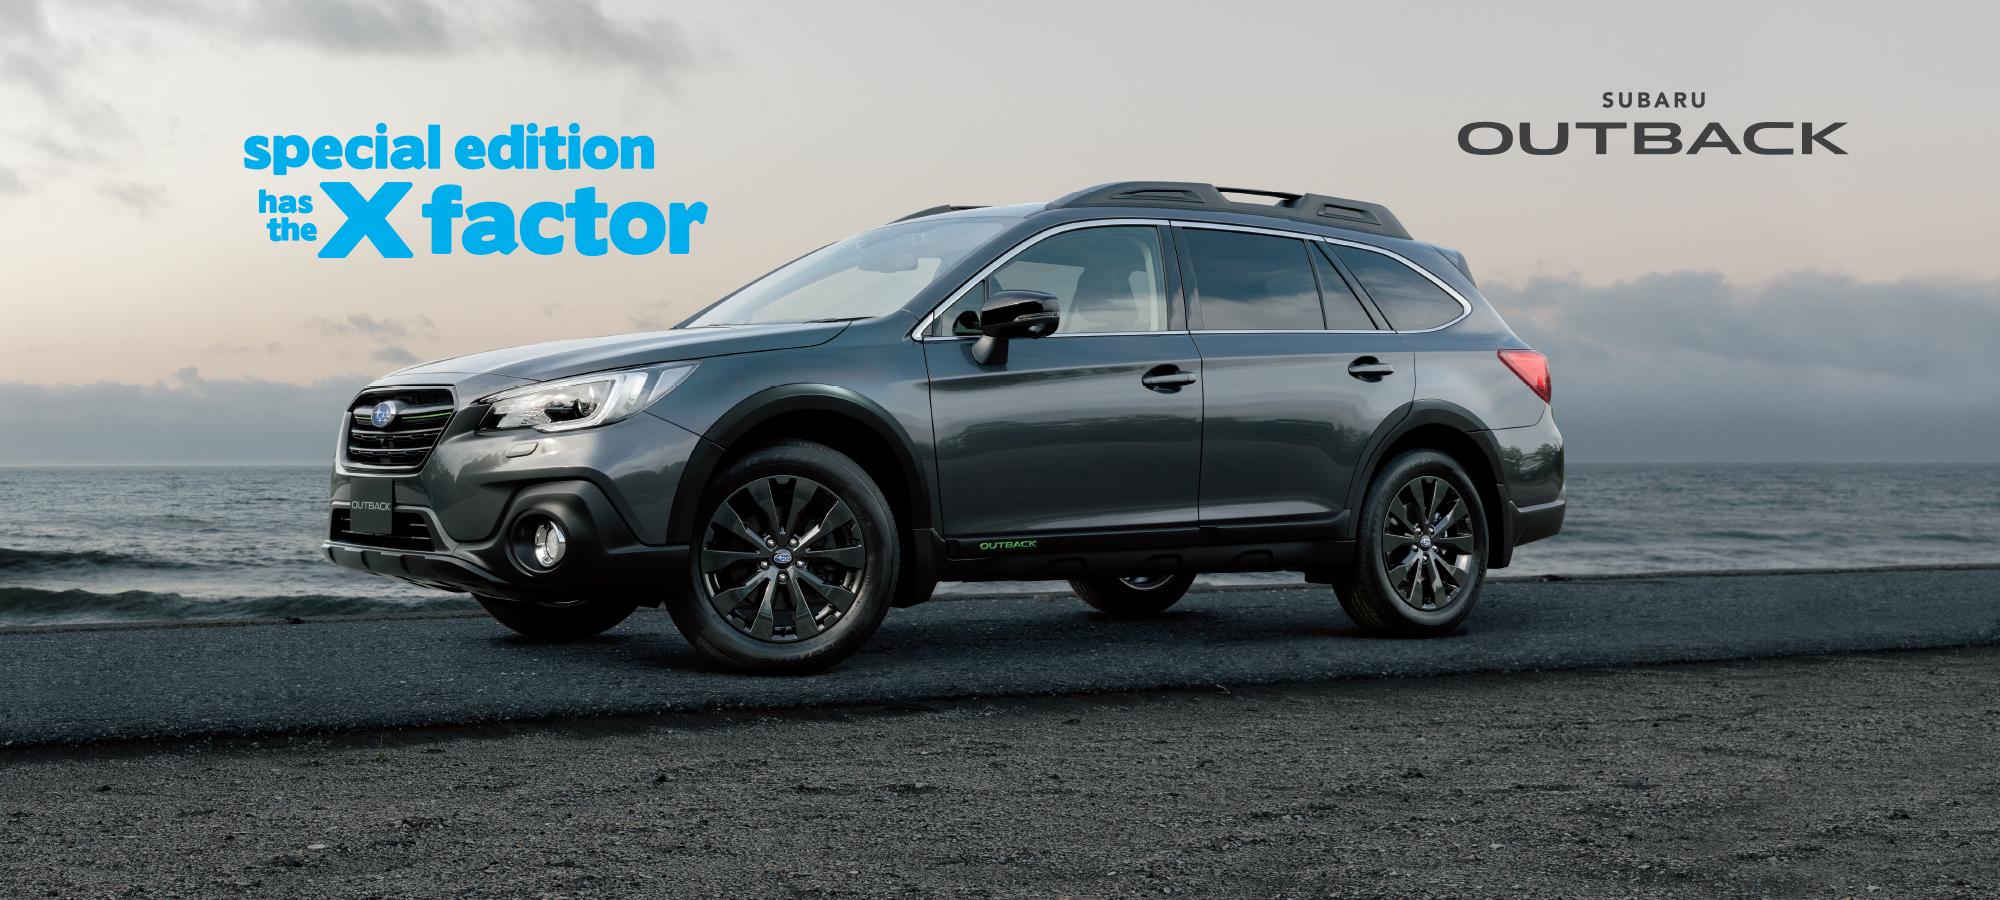 Bartons Bayside Subaru Outbak Special Edition